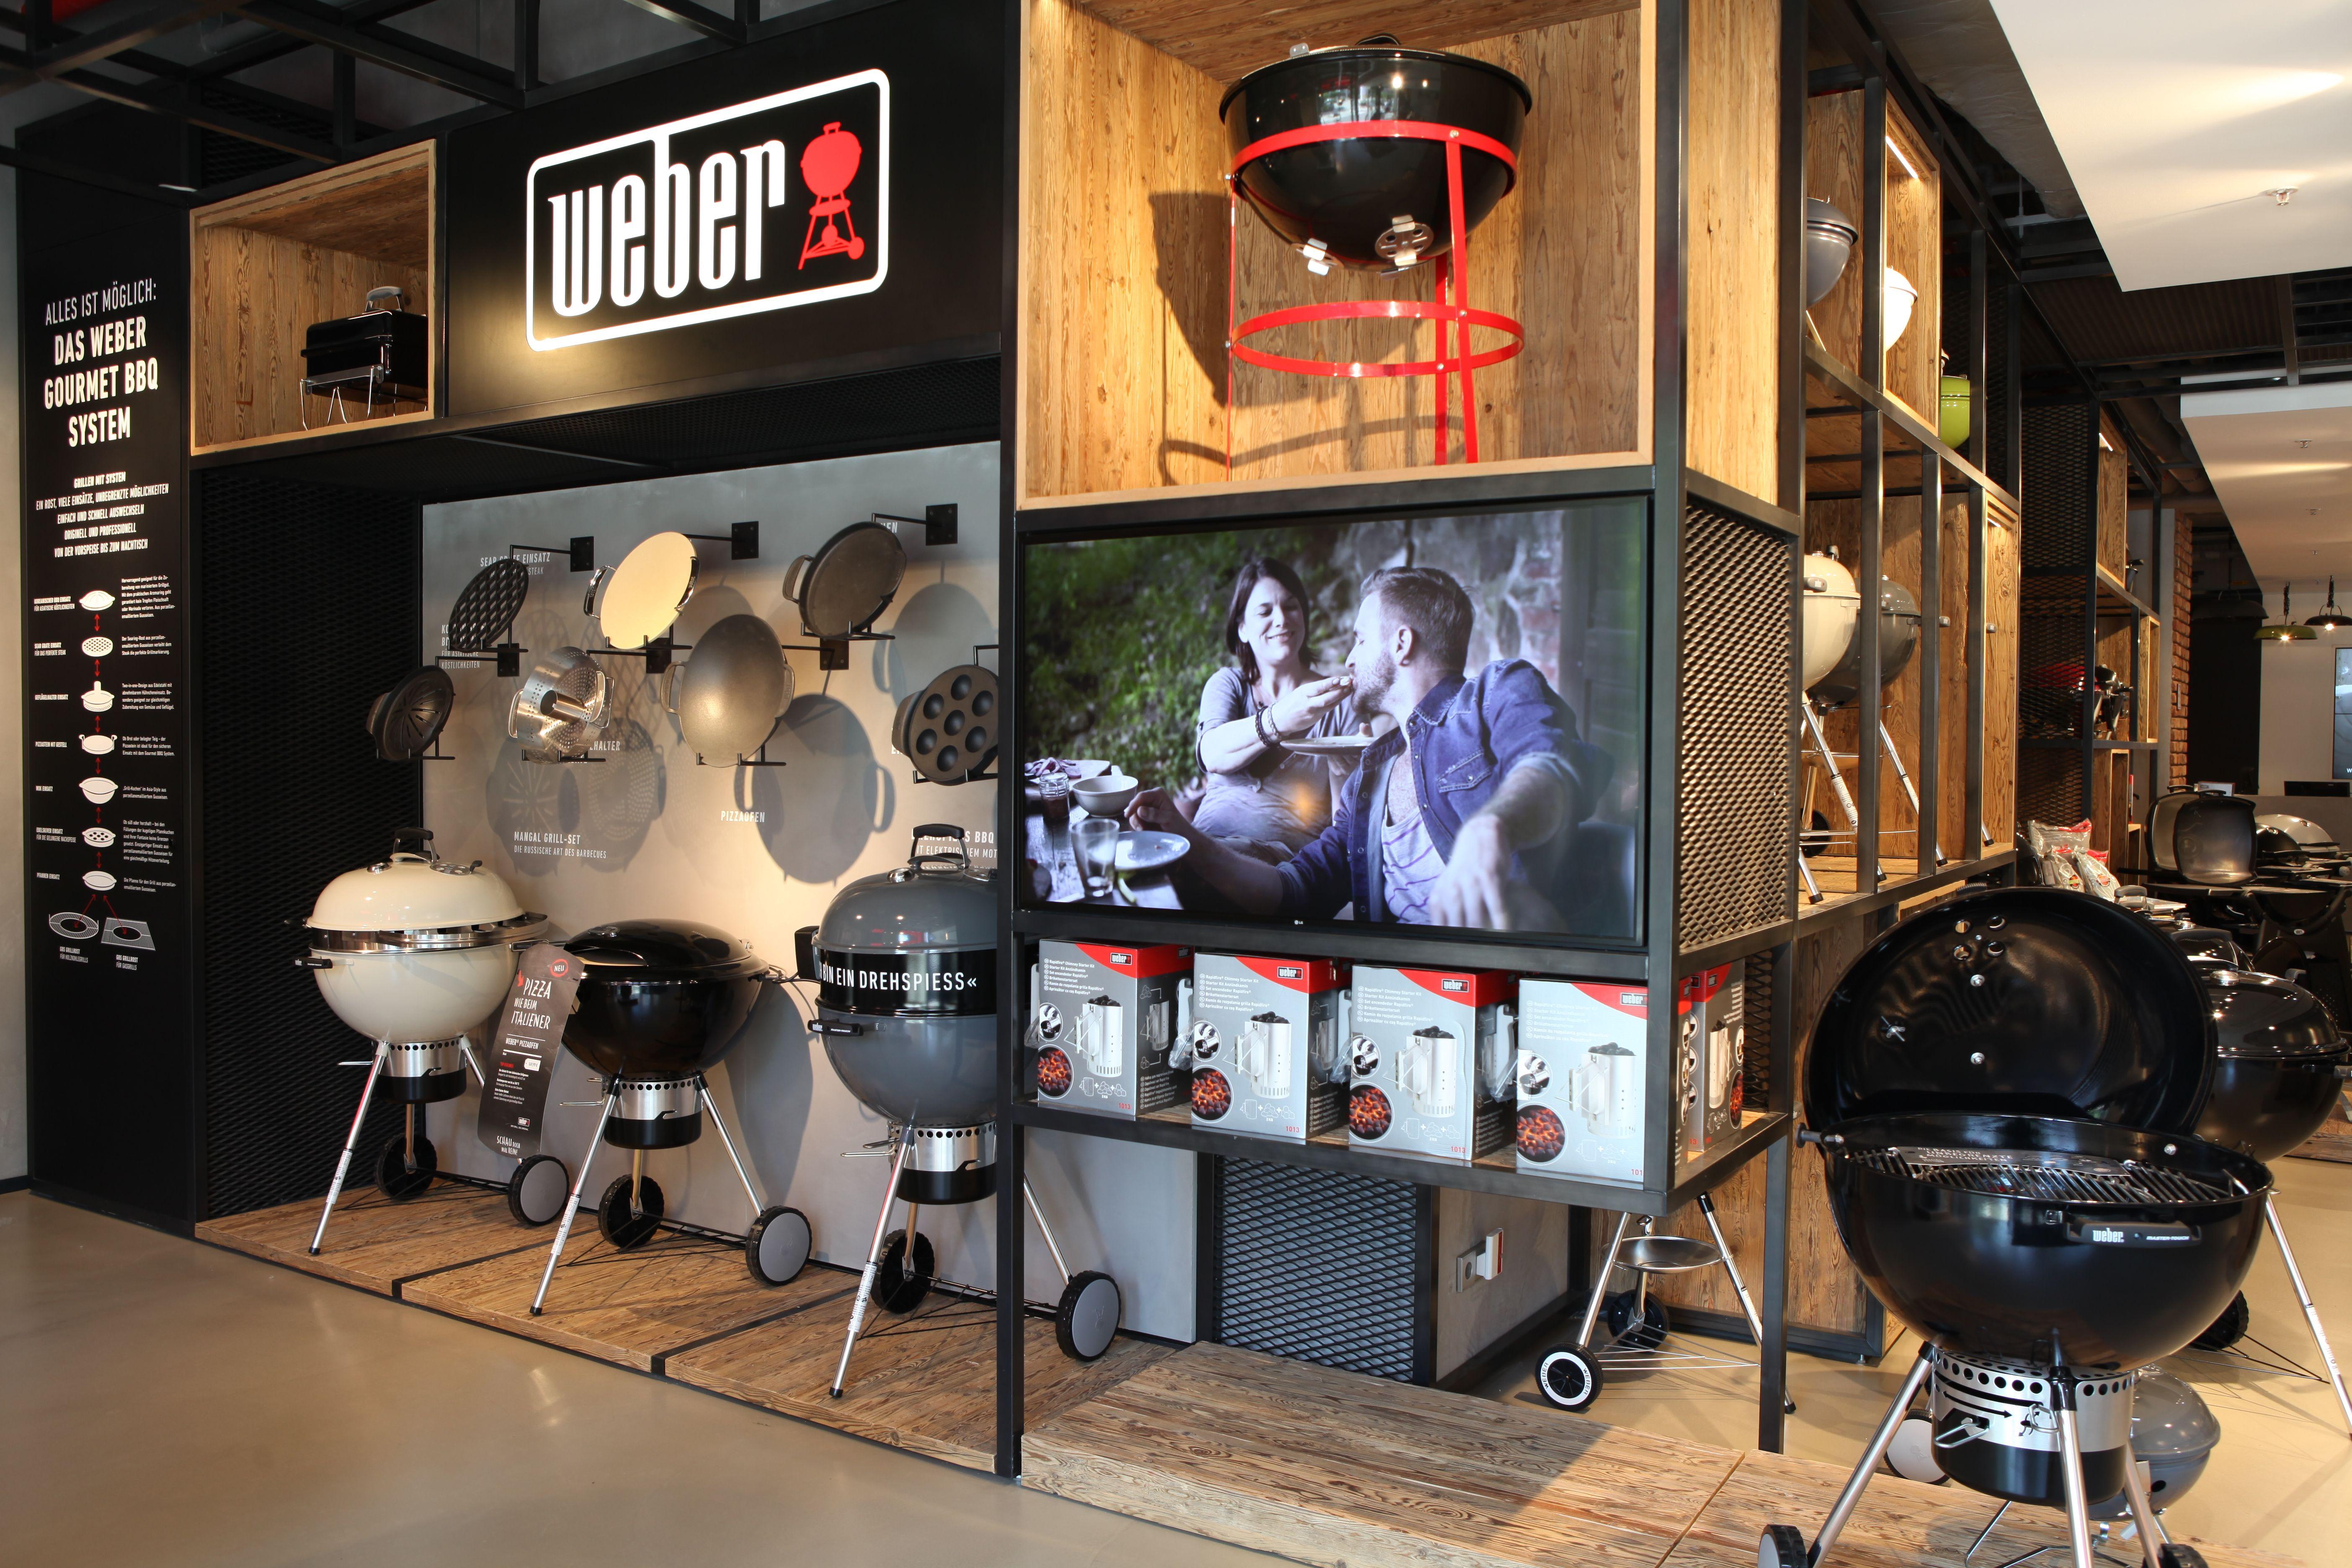 weber original store berlin weber original store berlin pinterest weber grill and originals. Black Bedroom Furniture Sets. Home Design Ideas